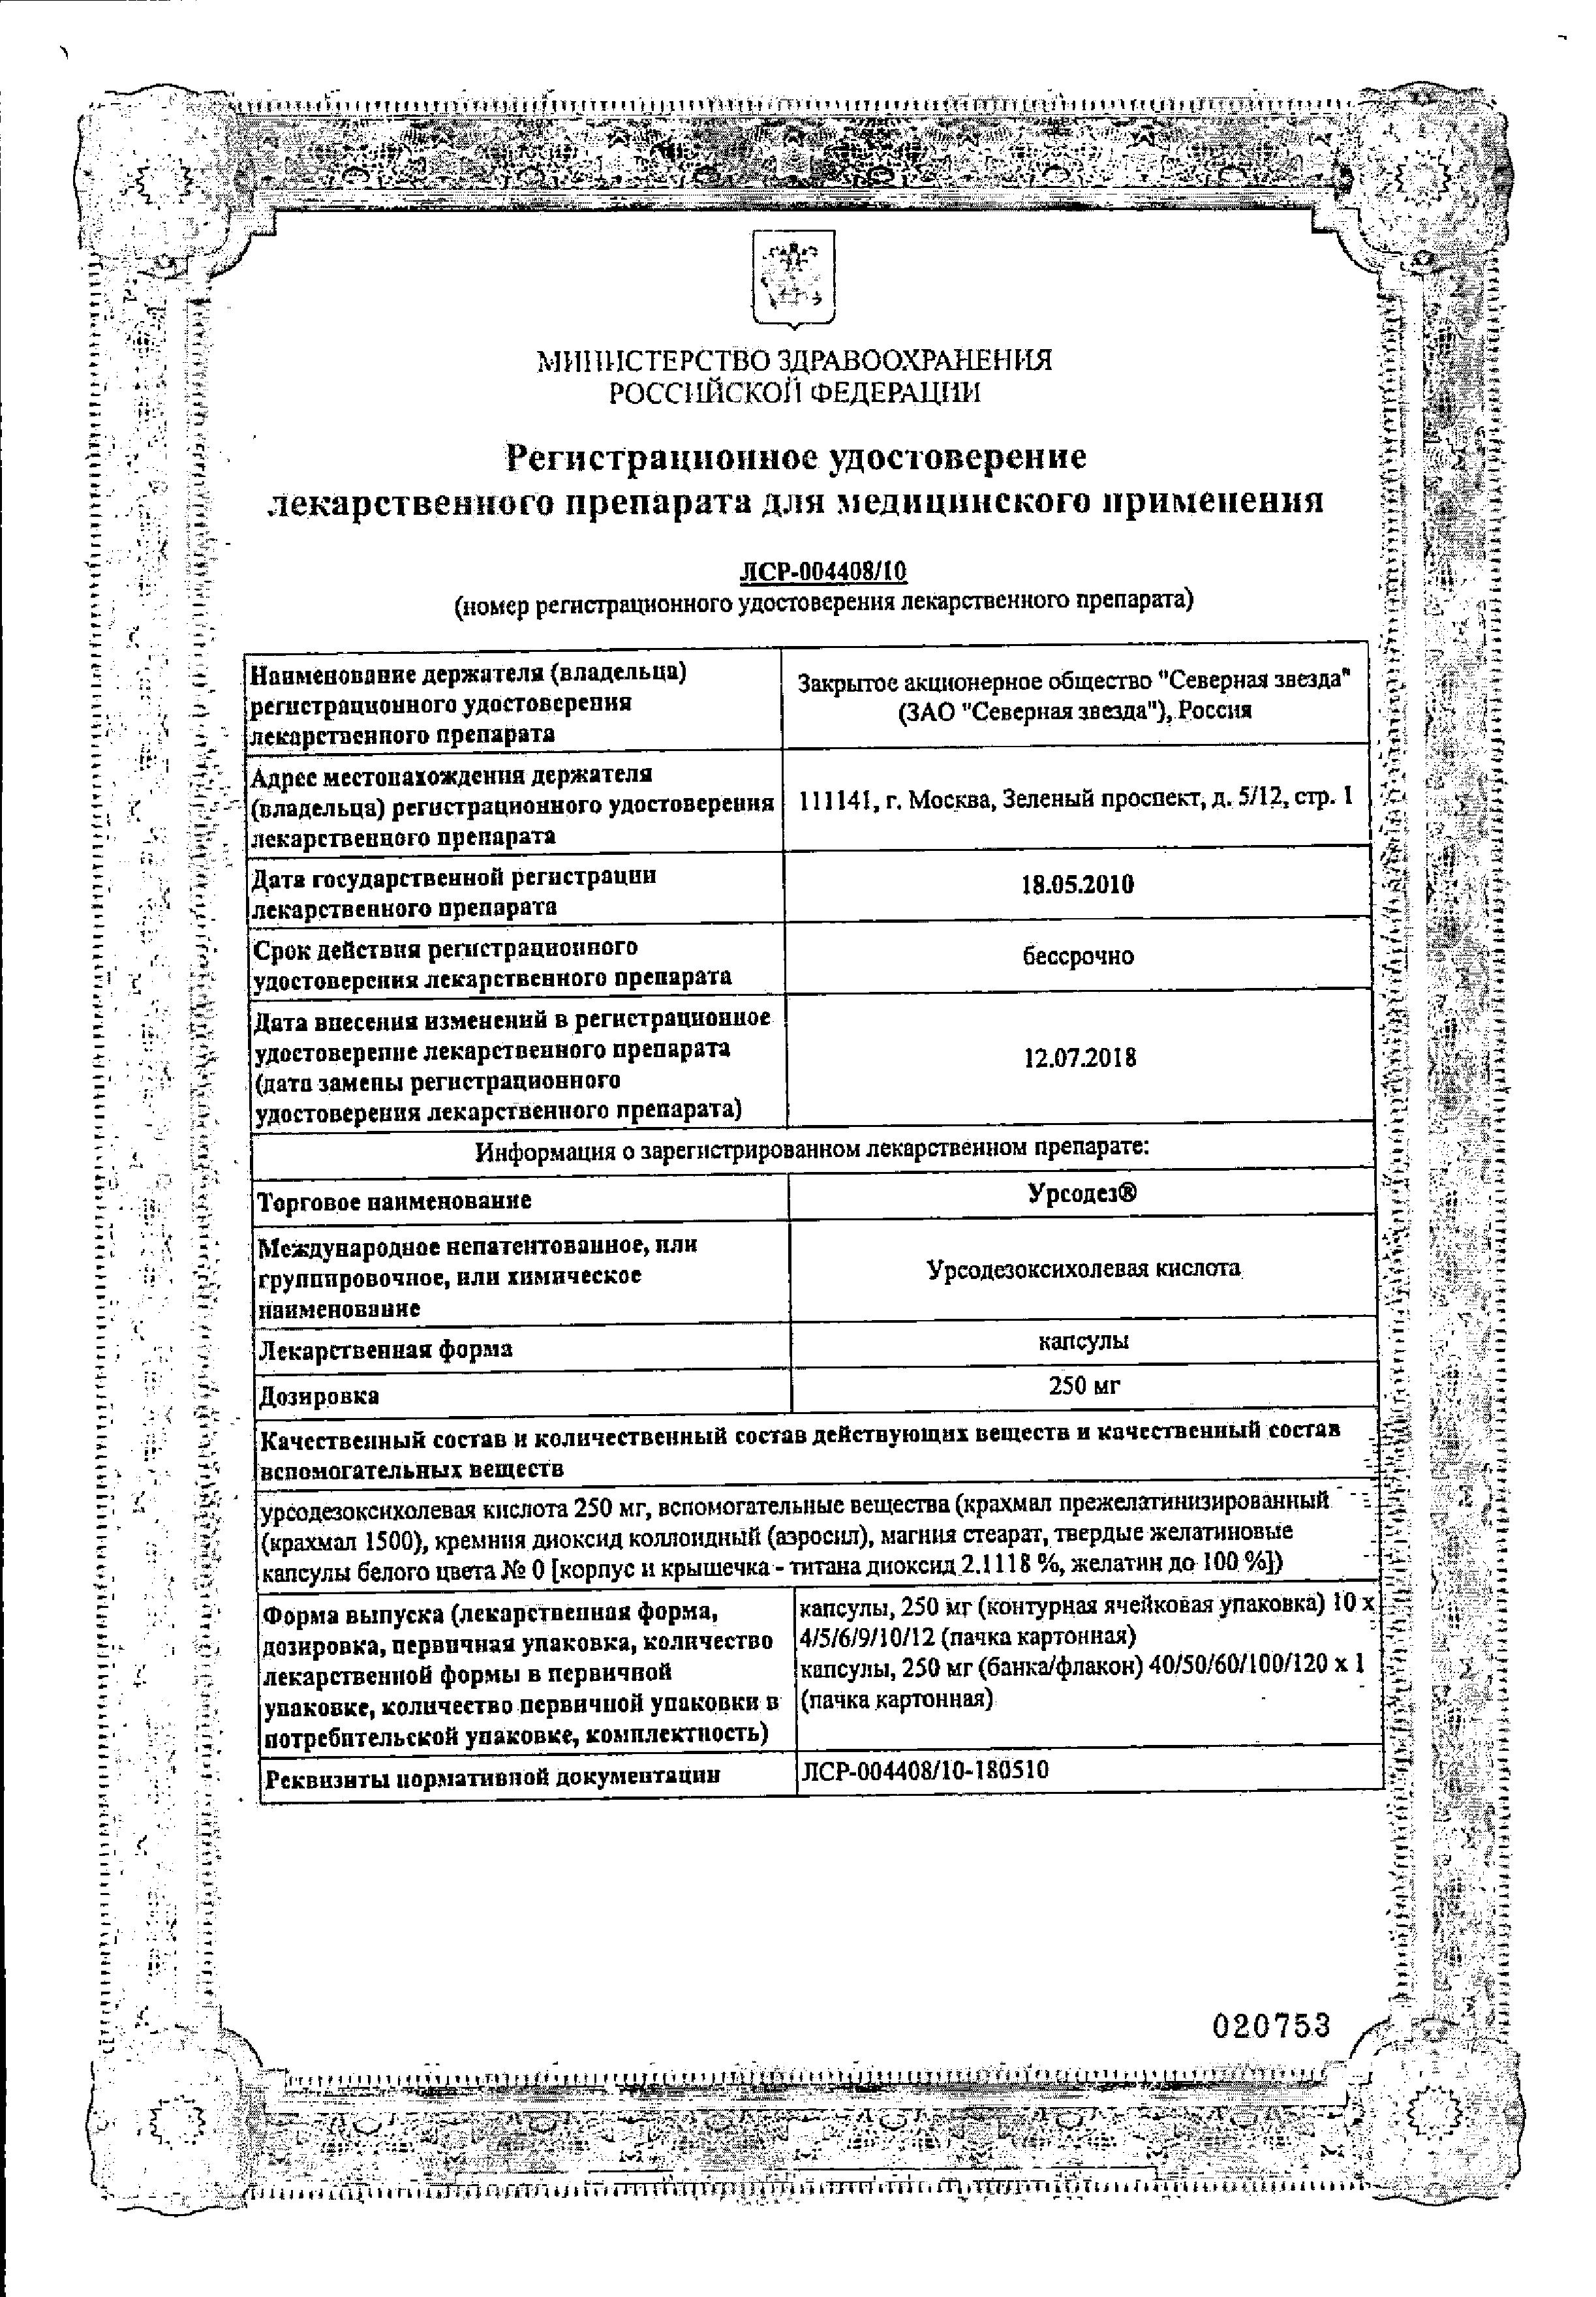 Урсодез сертификат